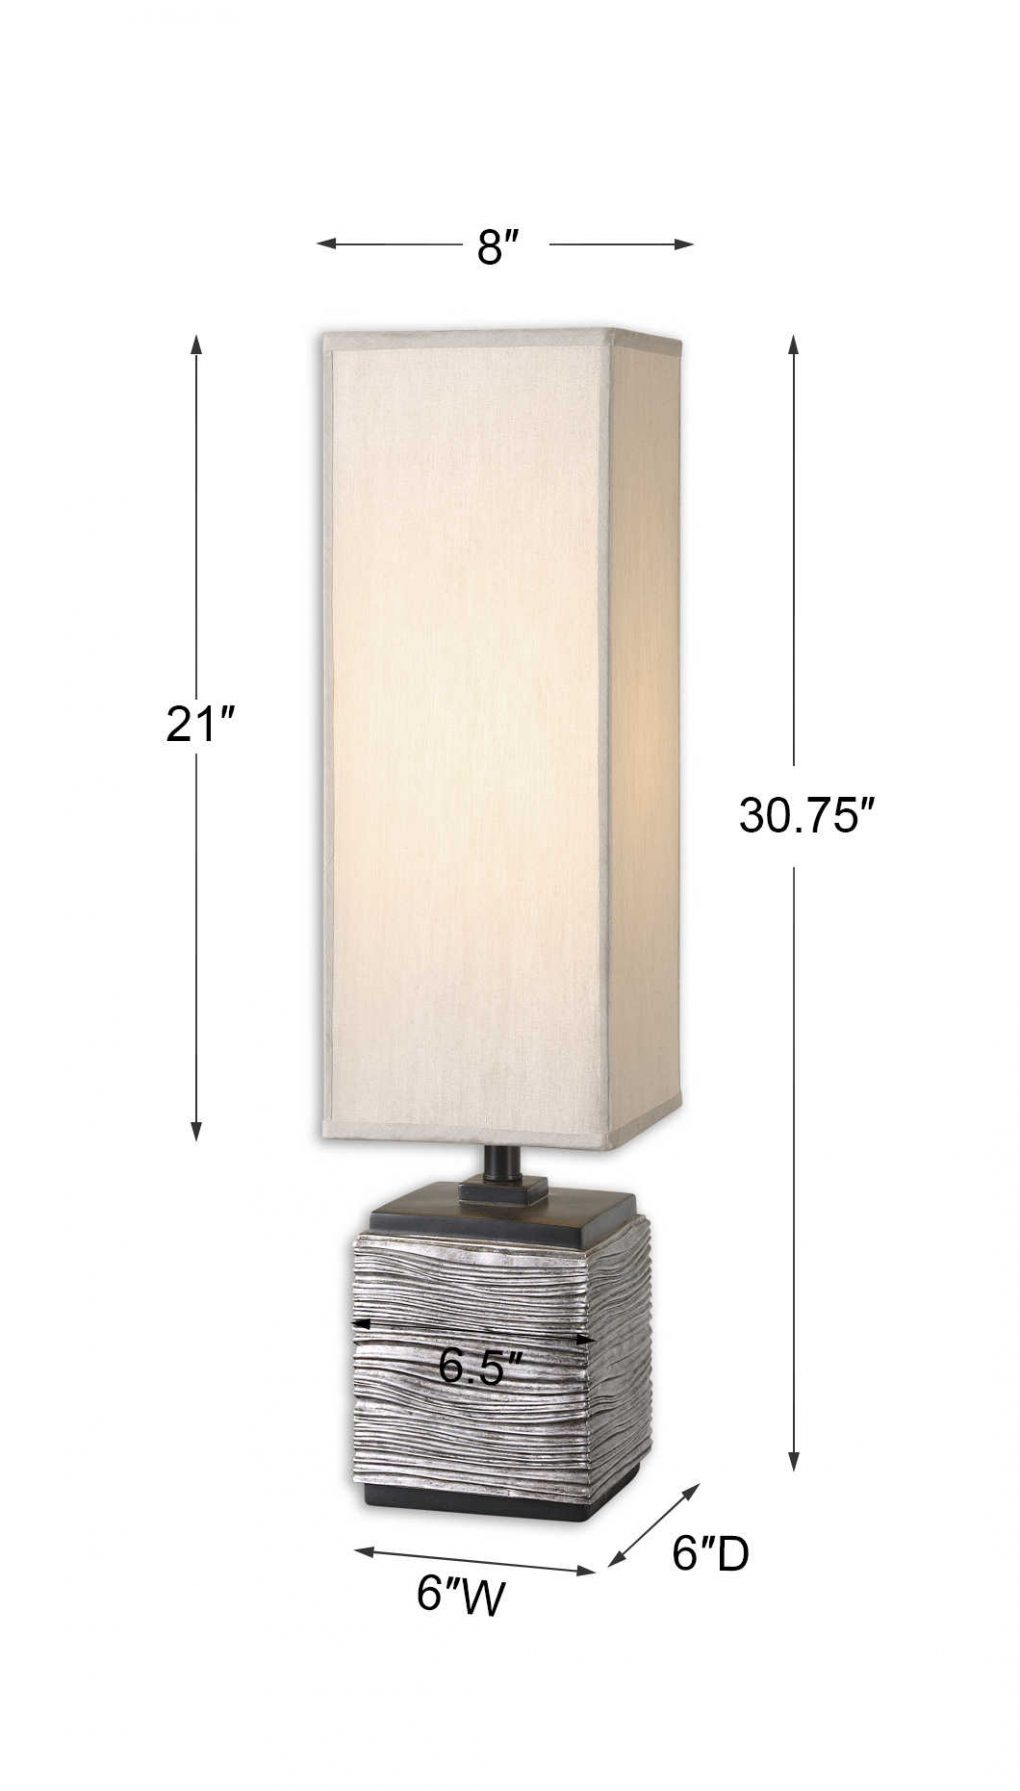 Uttermost Ciriaco Buffet Lamp Table Short Silver Medal Modern Light Shade